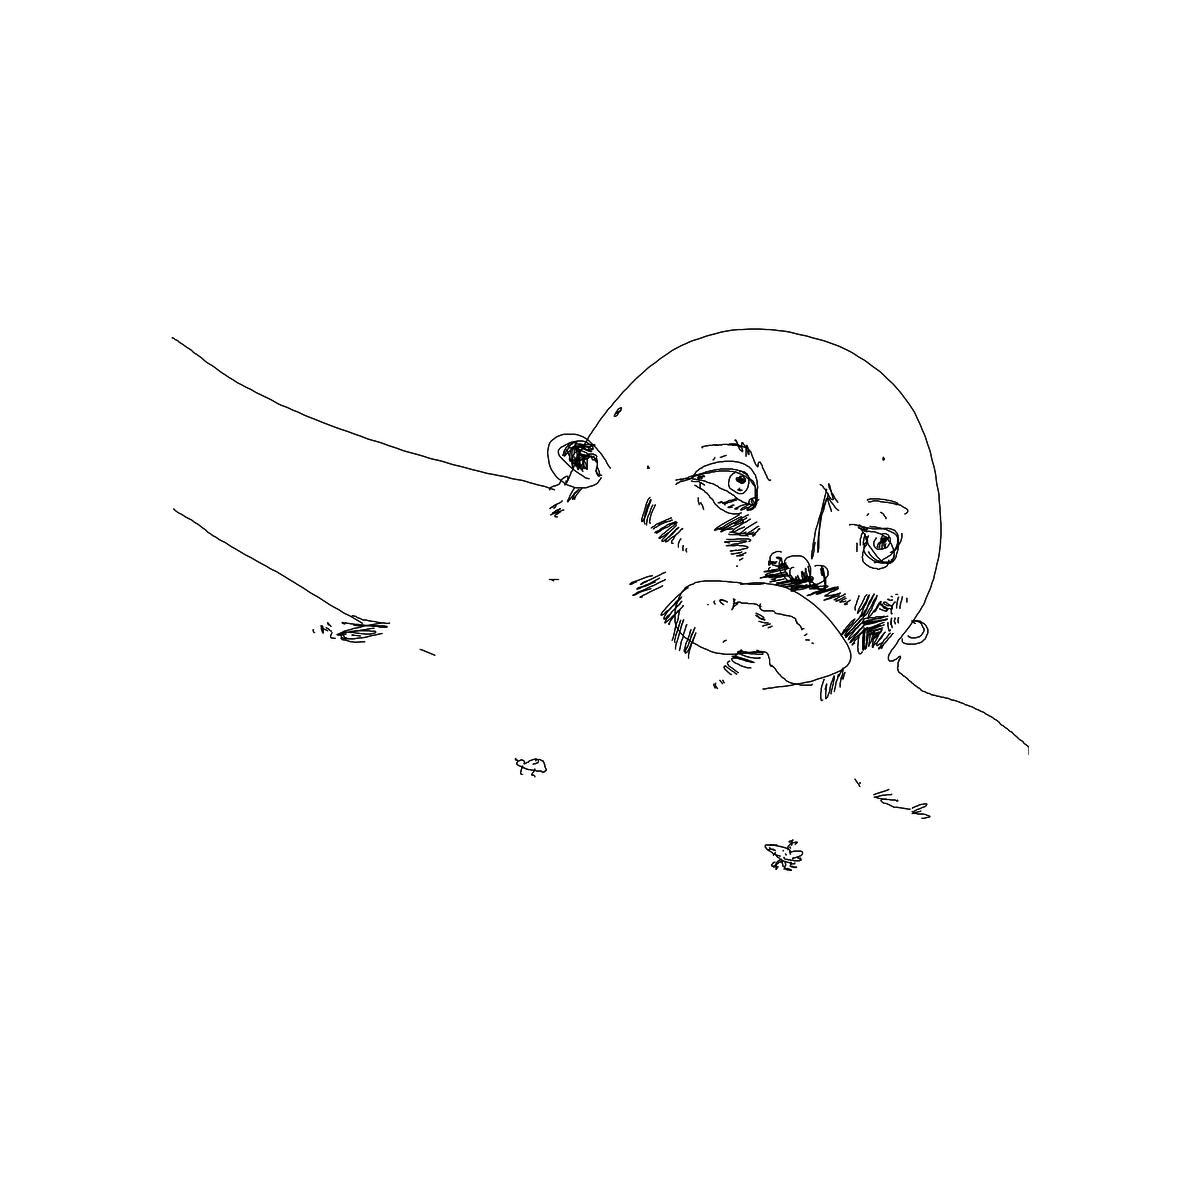 BAAAM drawing#16868 lat:78.4203262329101600lng: -4.4839811325073240